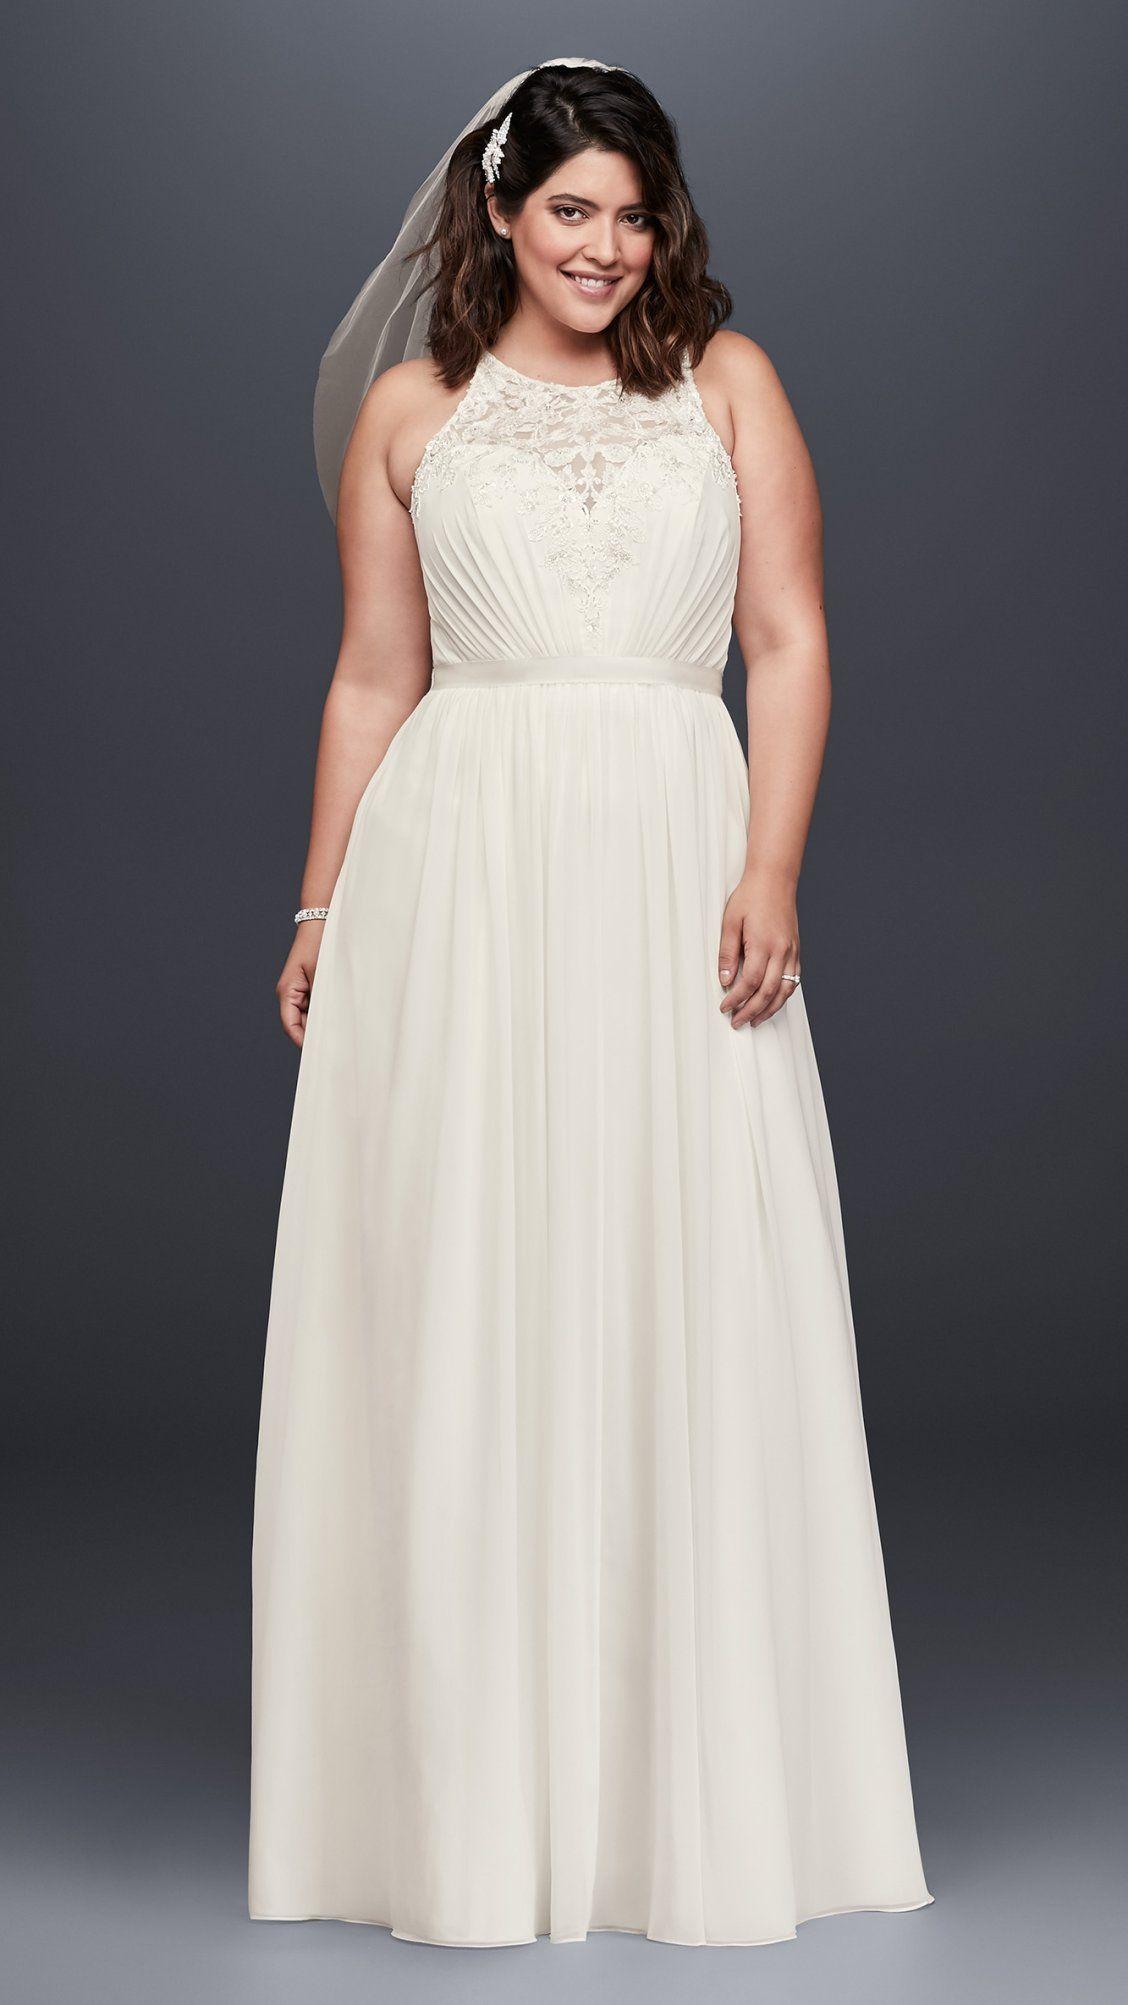 Beaded Chiffon Halter Plus Size Wedding Dress | David's Bridal | Halter wedding dress, Davids bridal wedding dresses, Plus size wedding gowns